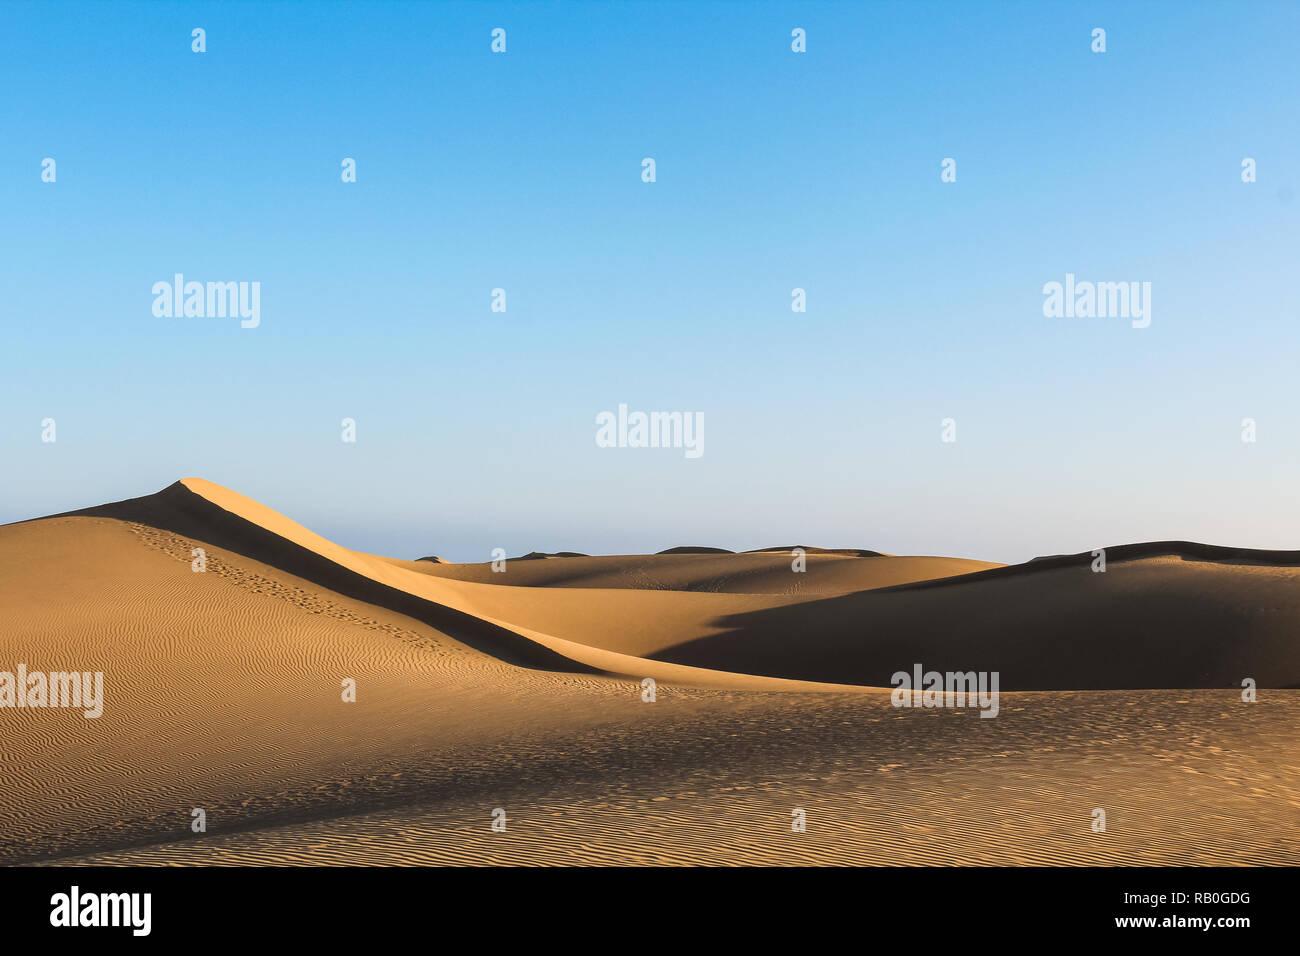 Cascading sand dunes in the vast desert casting long shadows during sunset (Dunas de Maspalomas, Gran Canaria, Spain, Europe) - Stock Image